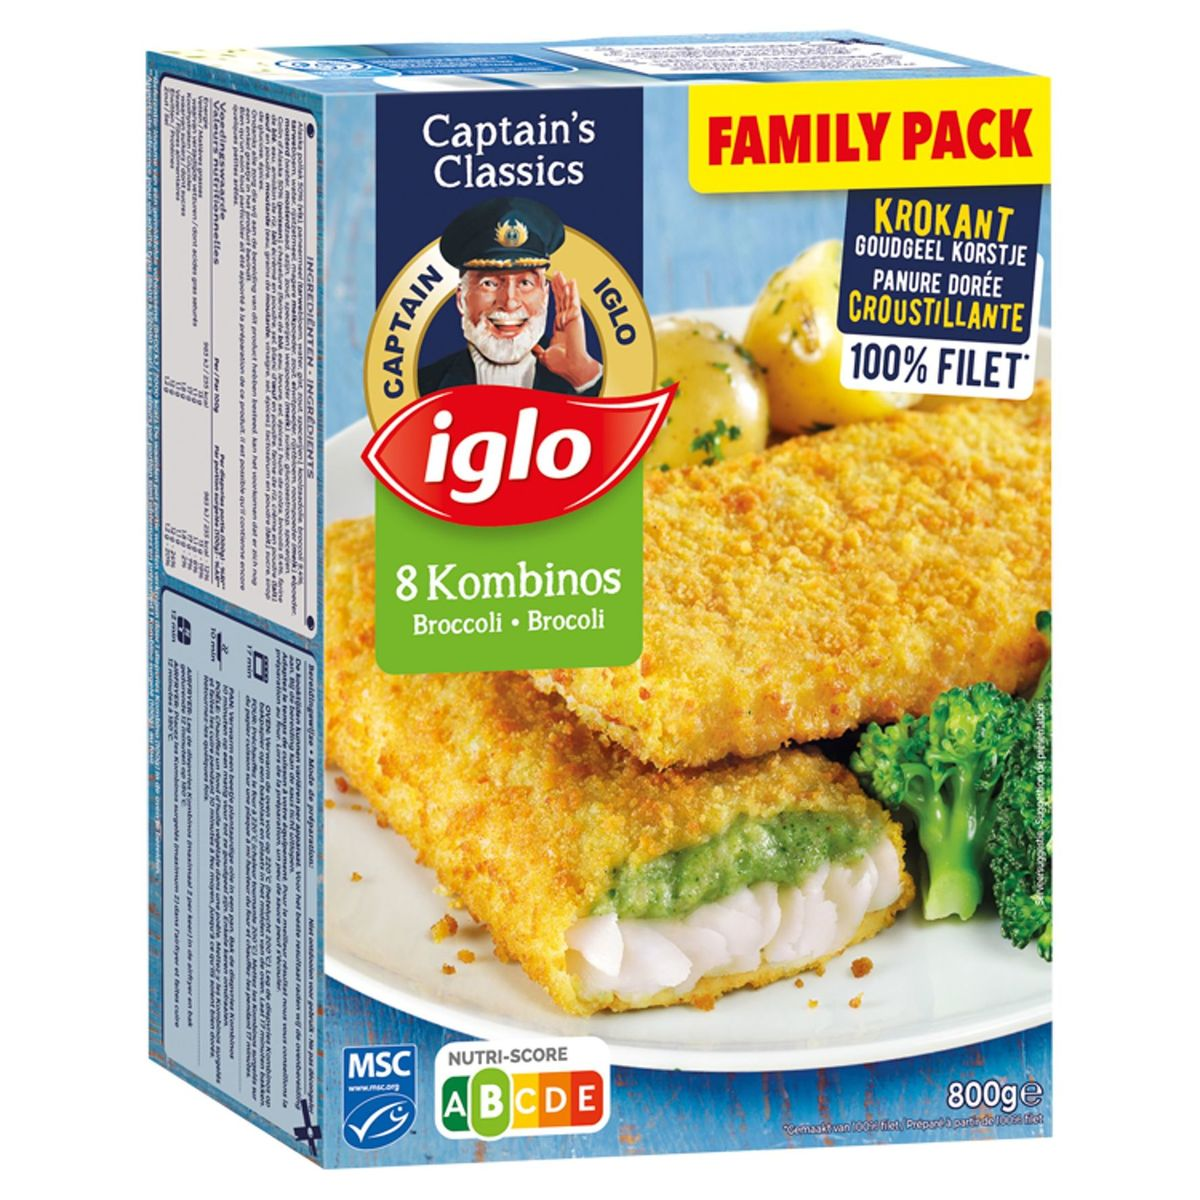 Iglo 8 Filets de Poisson Pané au Brocoli 800 g